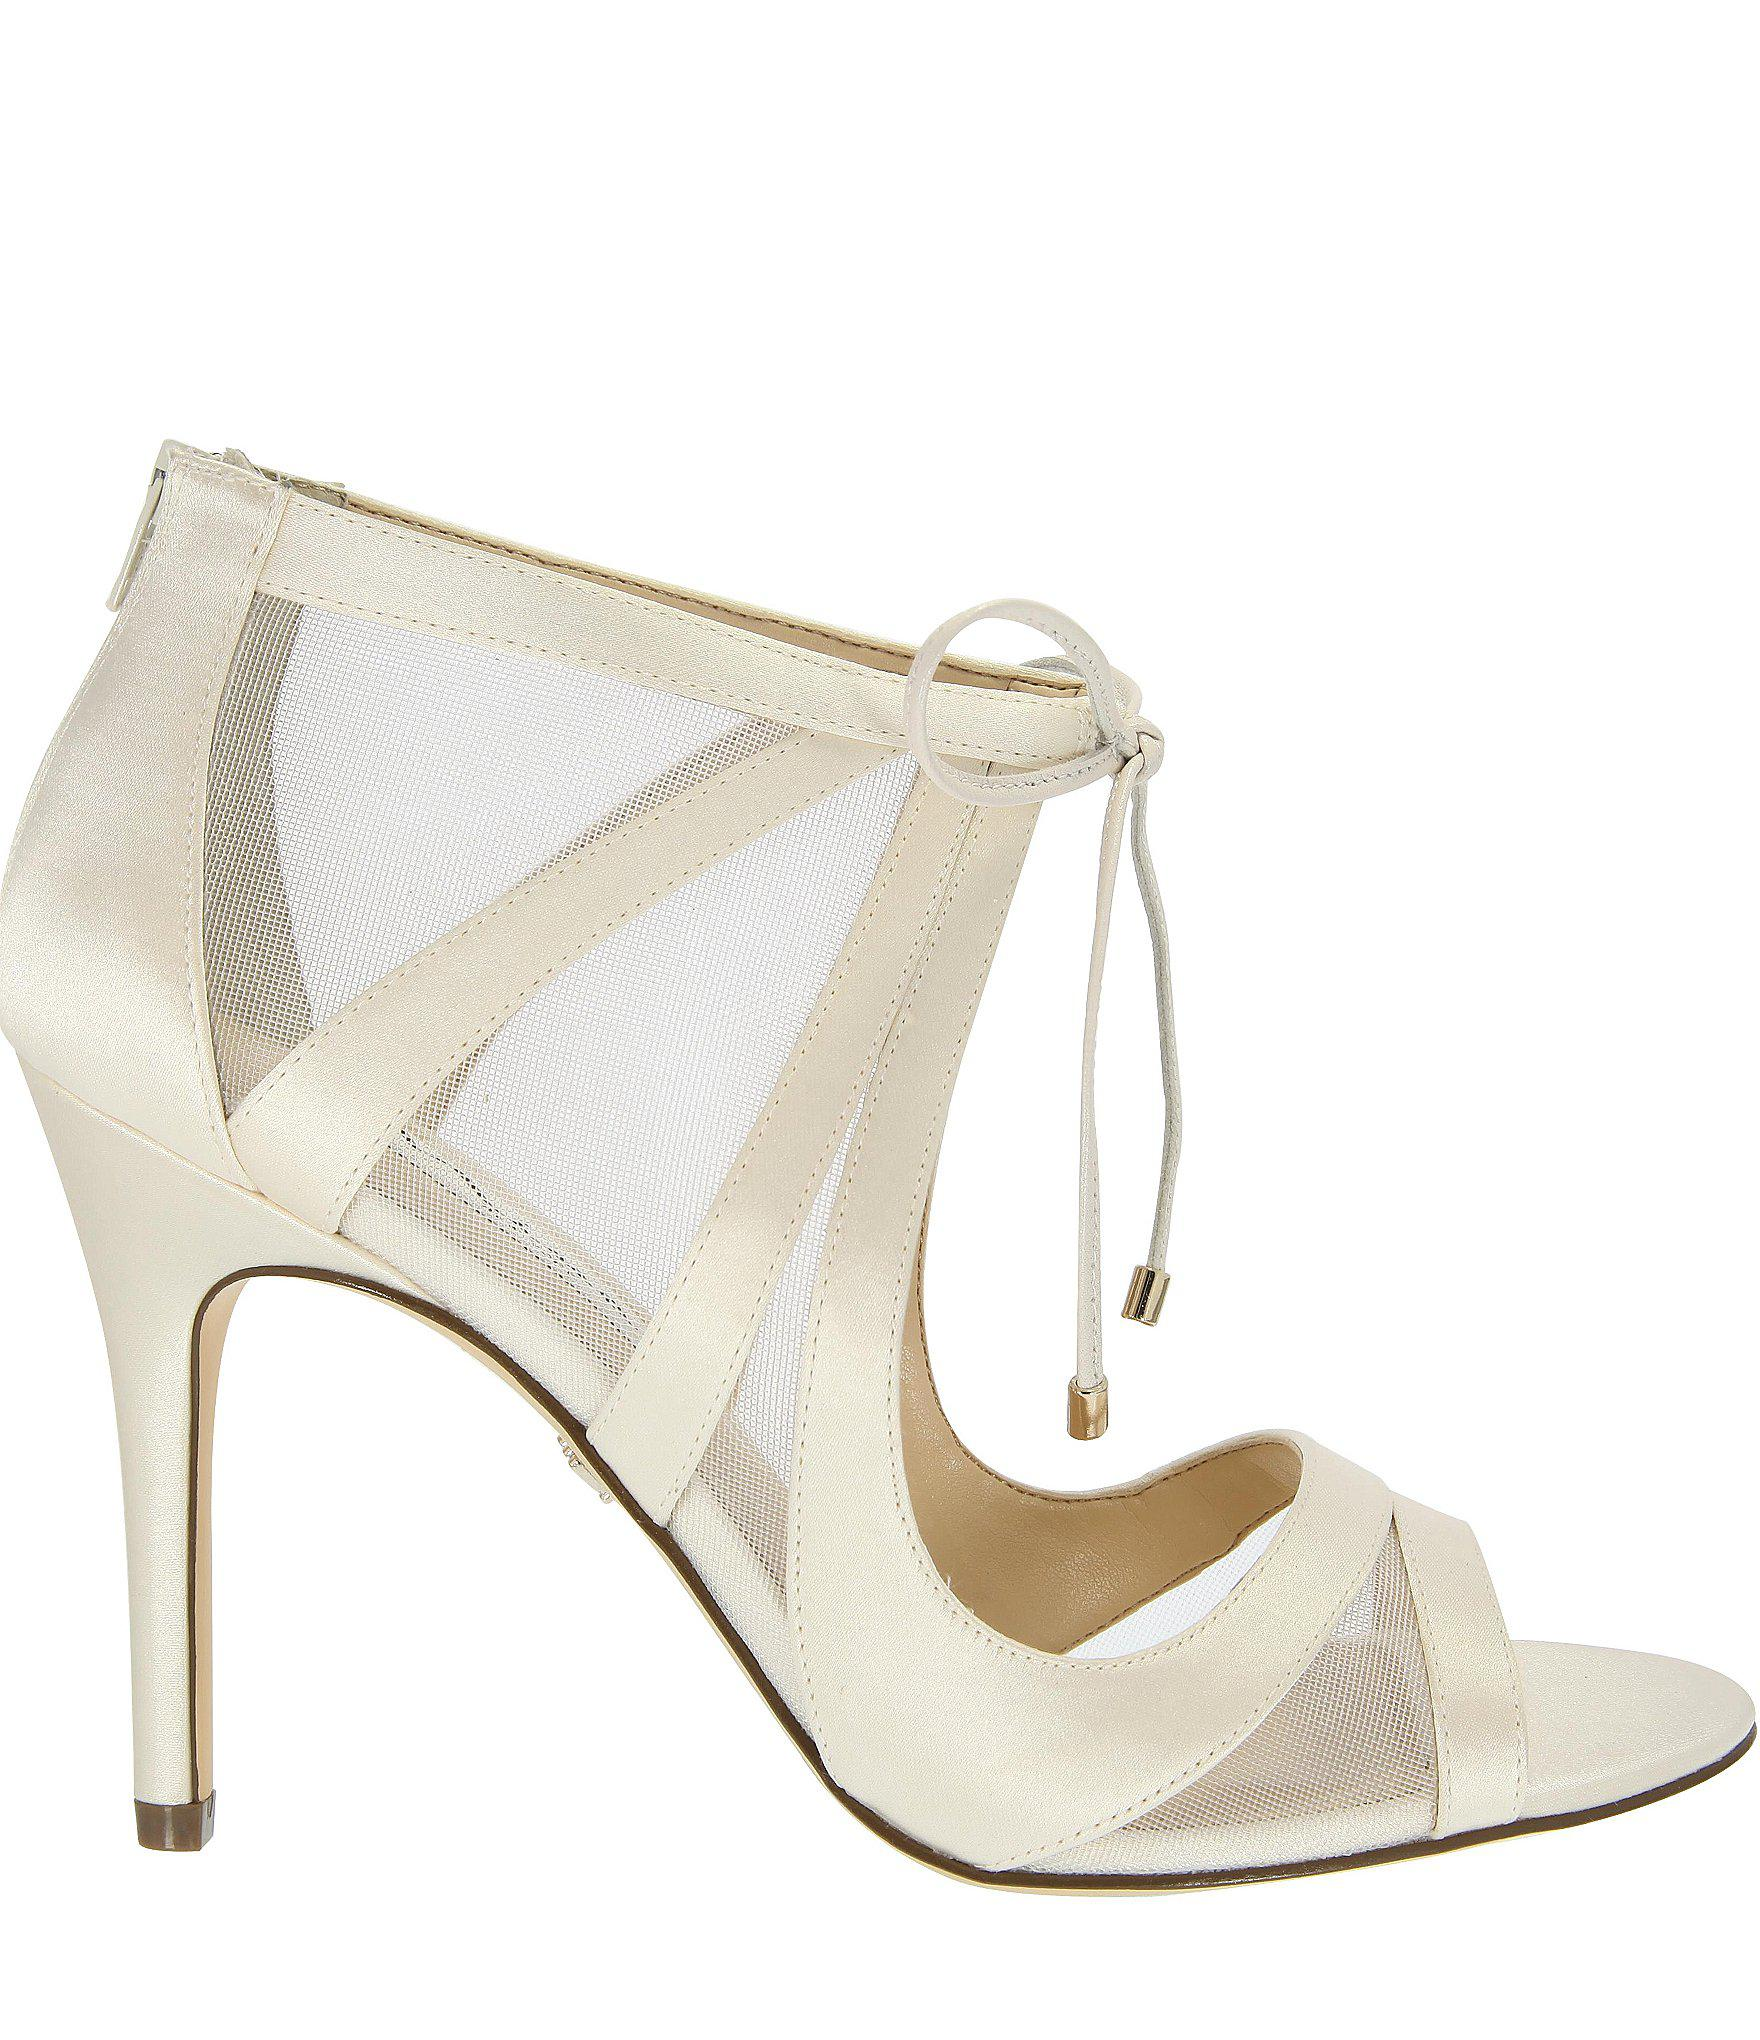 Lyst - Nina Cherie Satin   Mesh Ankle Tie Dress Sandals in White ...